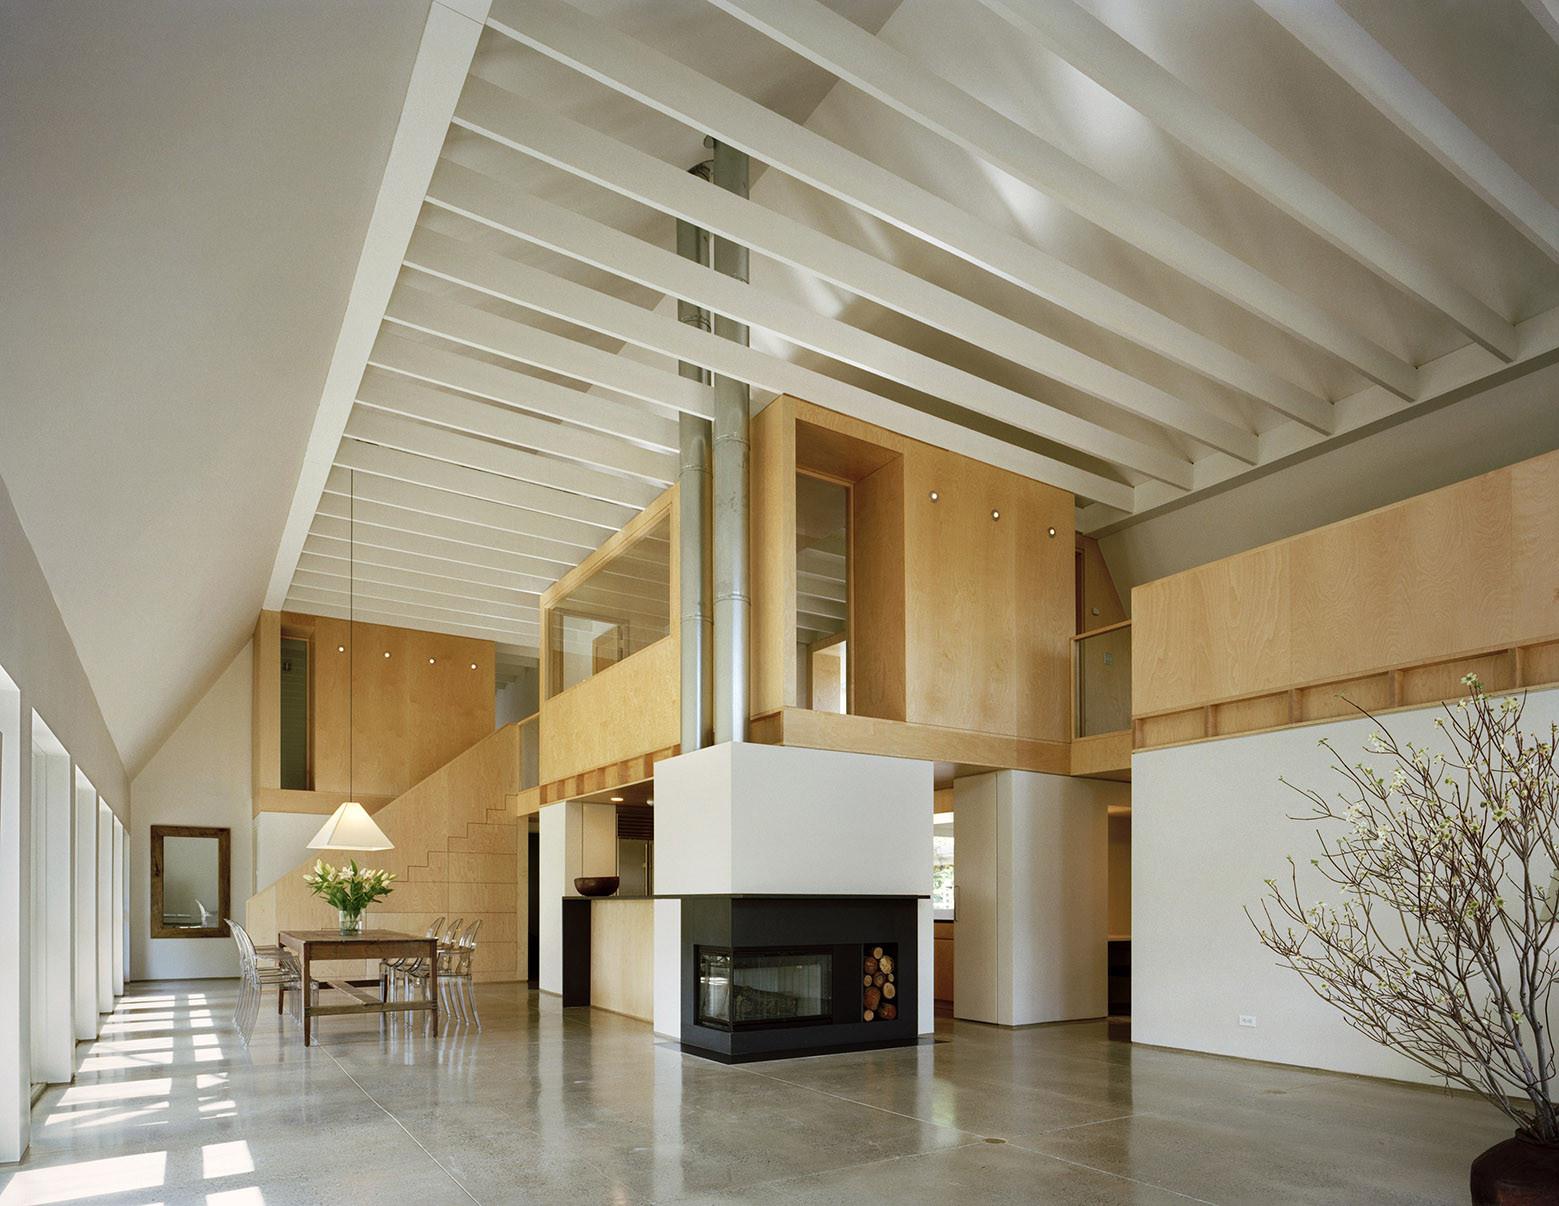 Gallery of modern barn specht harpman 4 - The contemporary barn ...